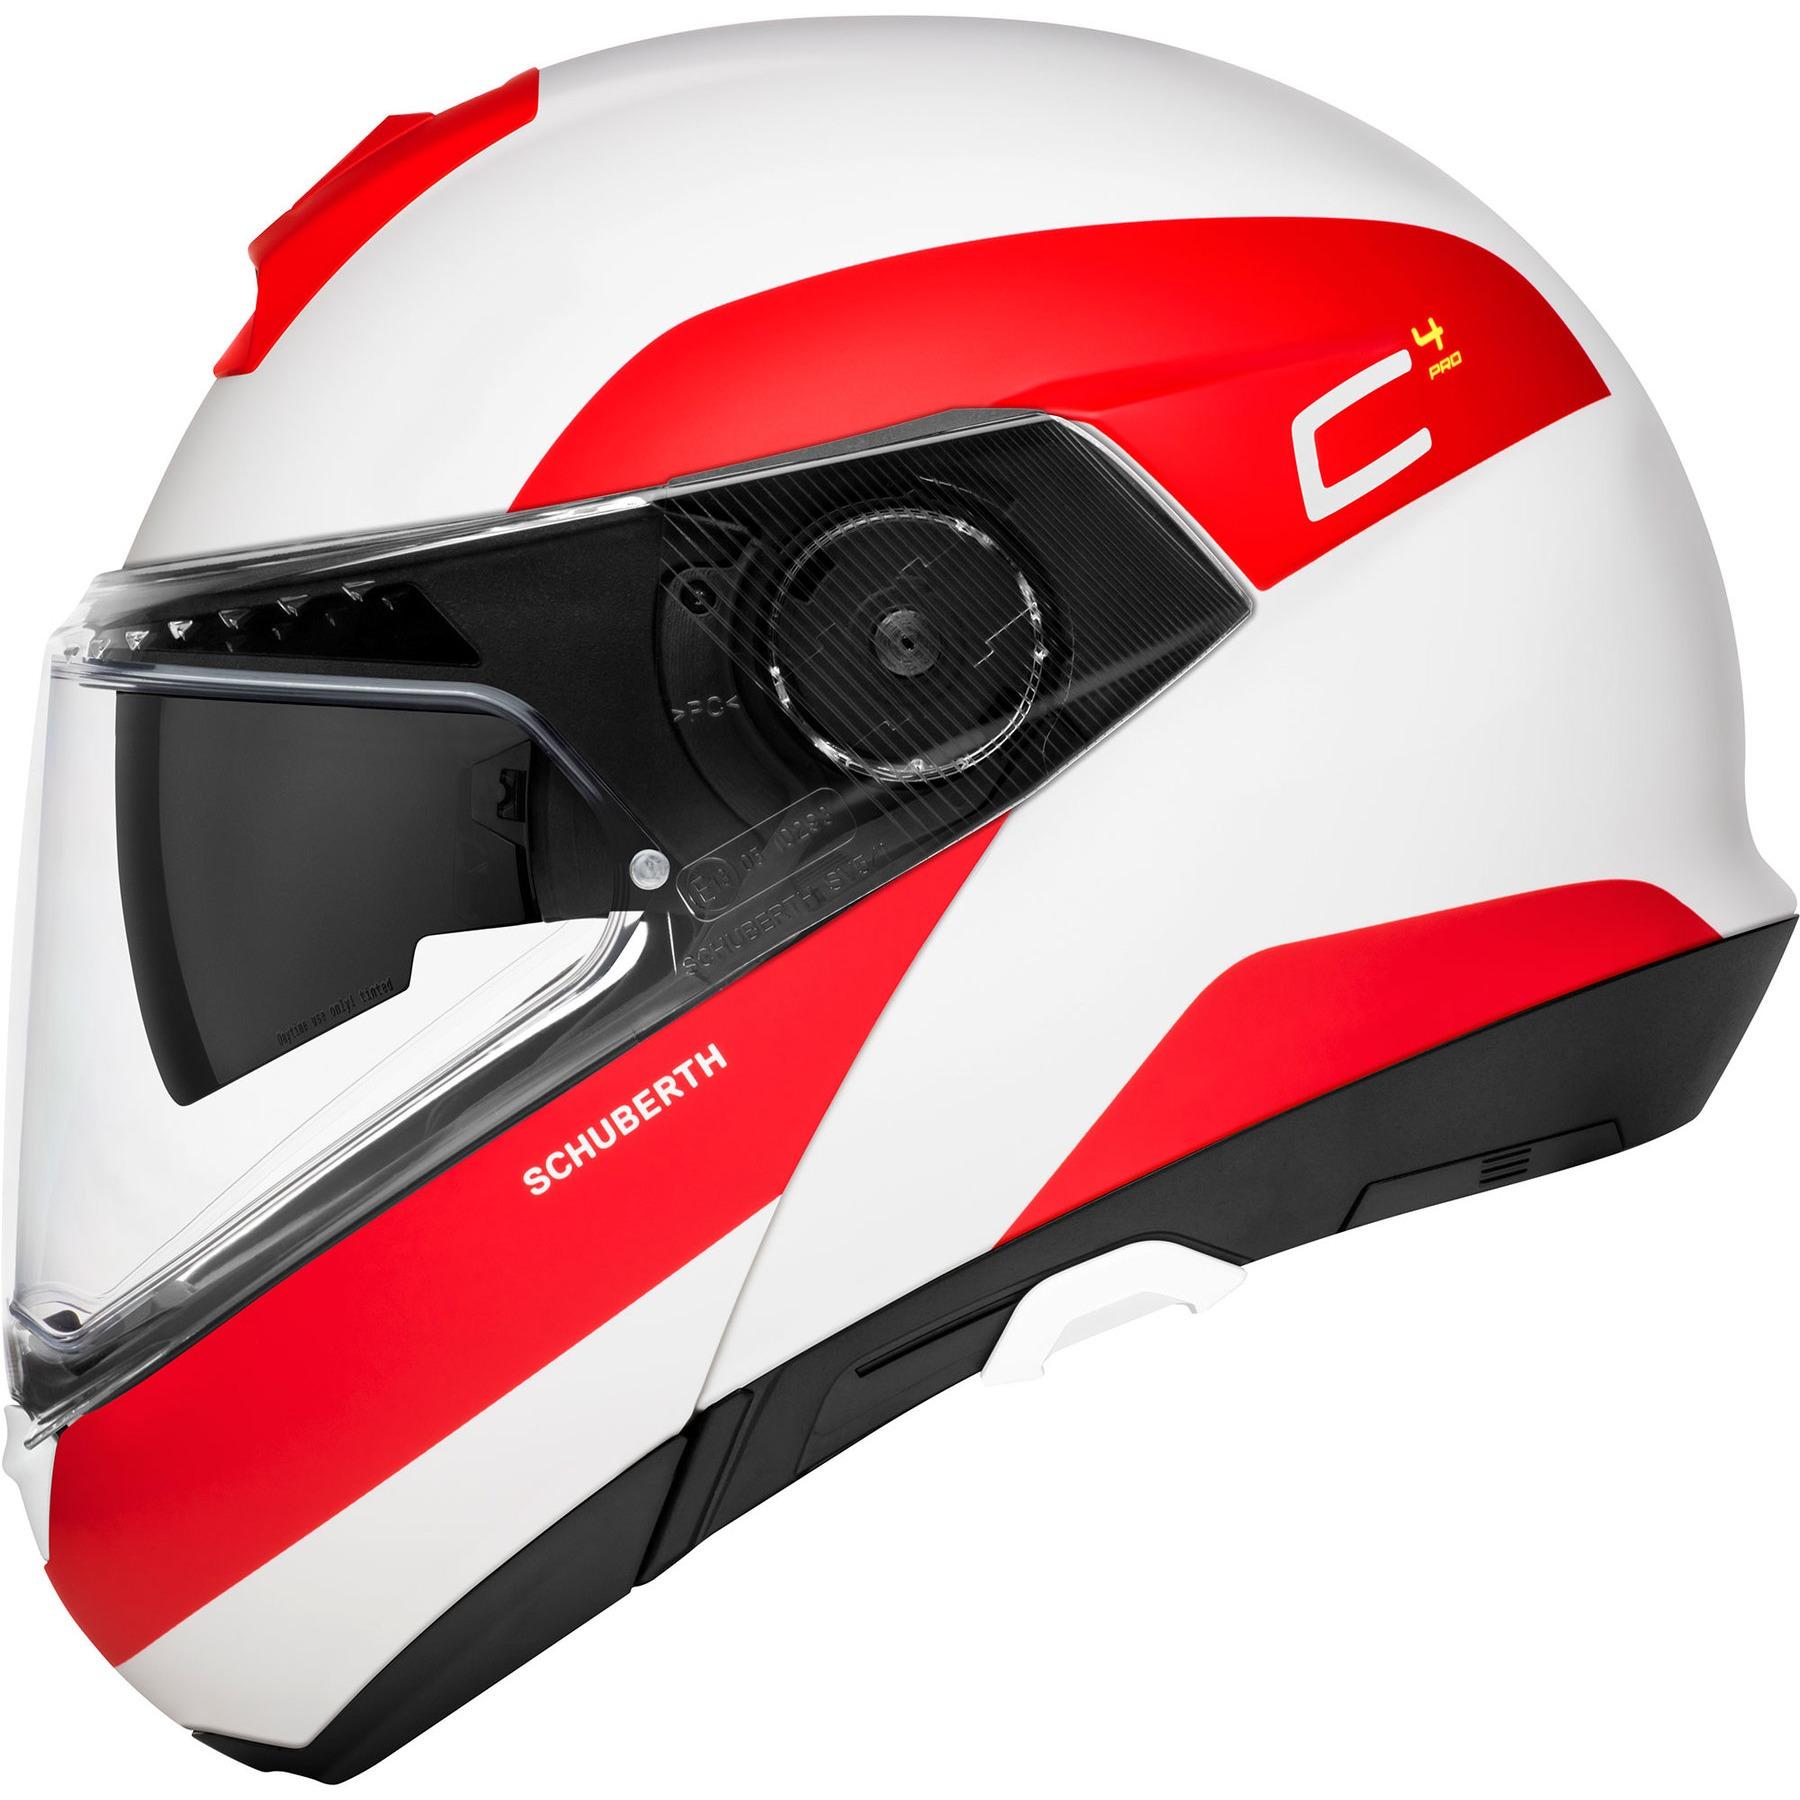 Schuberth Motorbike Motorcycle Helmet Textile Carry Bag